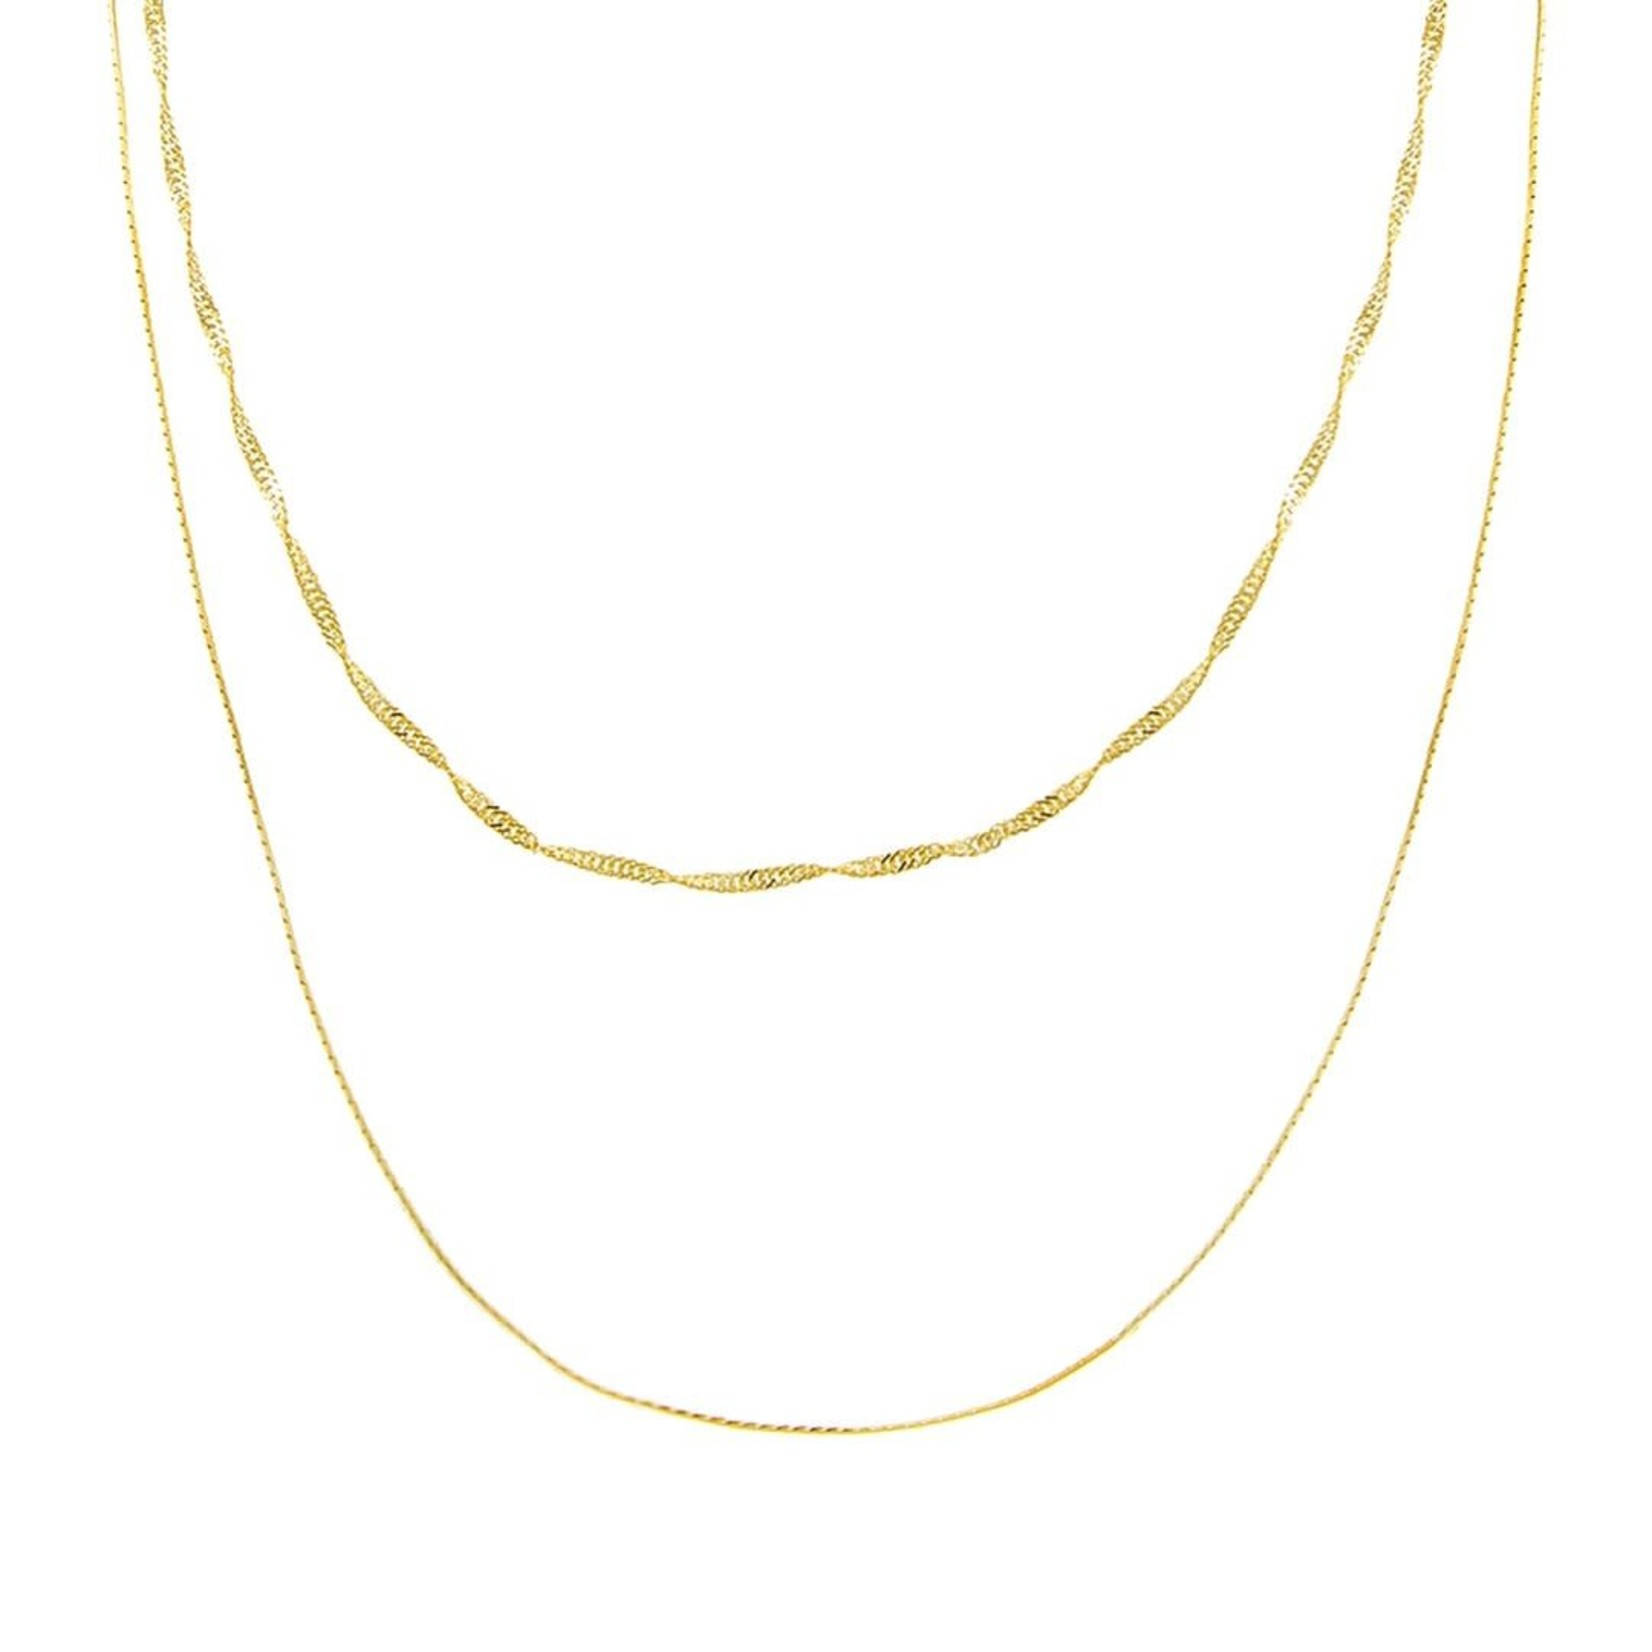 Adinas Double Chain Singapore X Snake Necklace